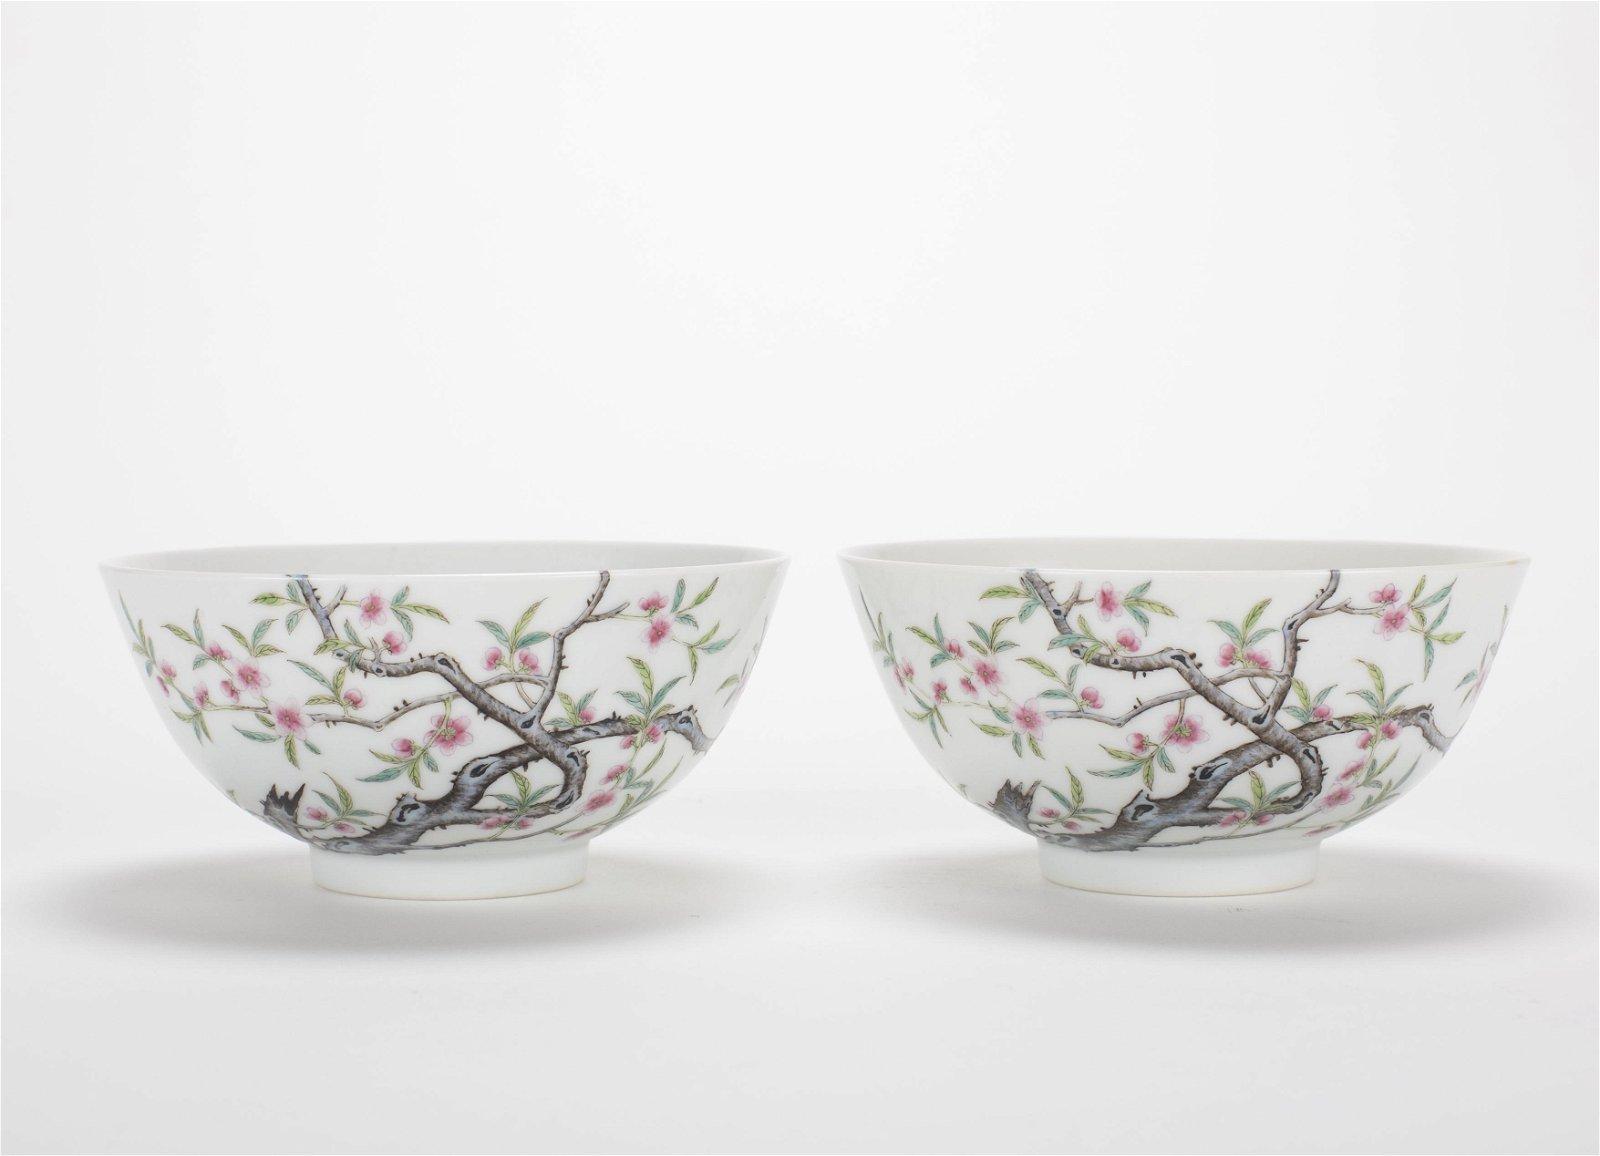 Pair Chinese Fencai Peach Blossom Porcelain Bowls